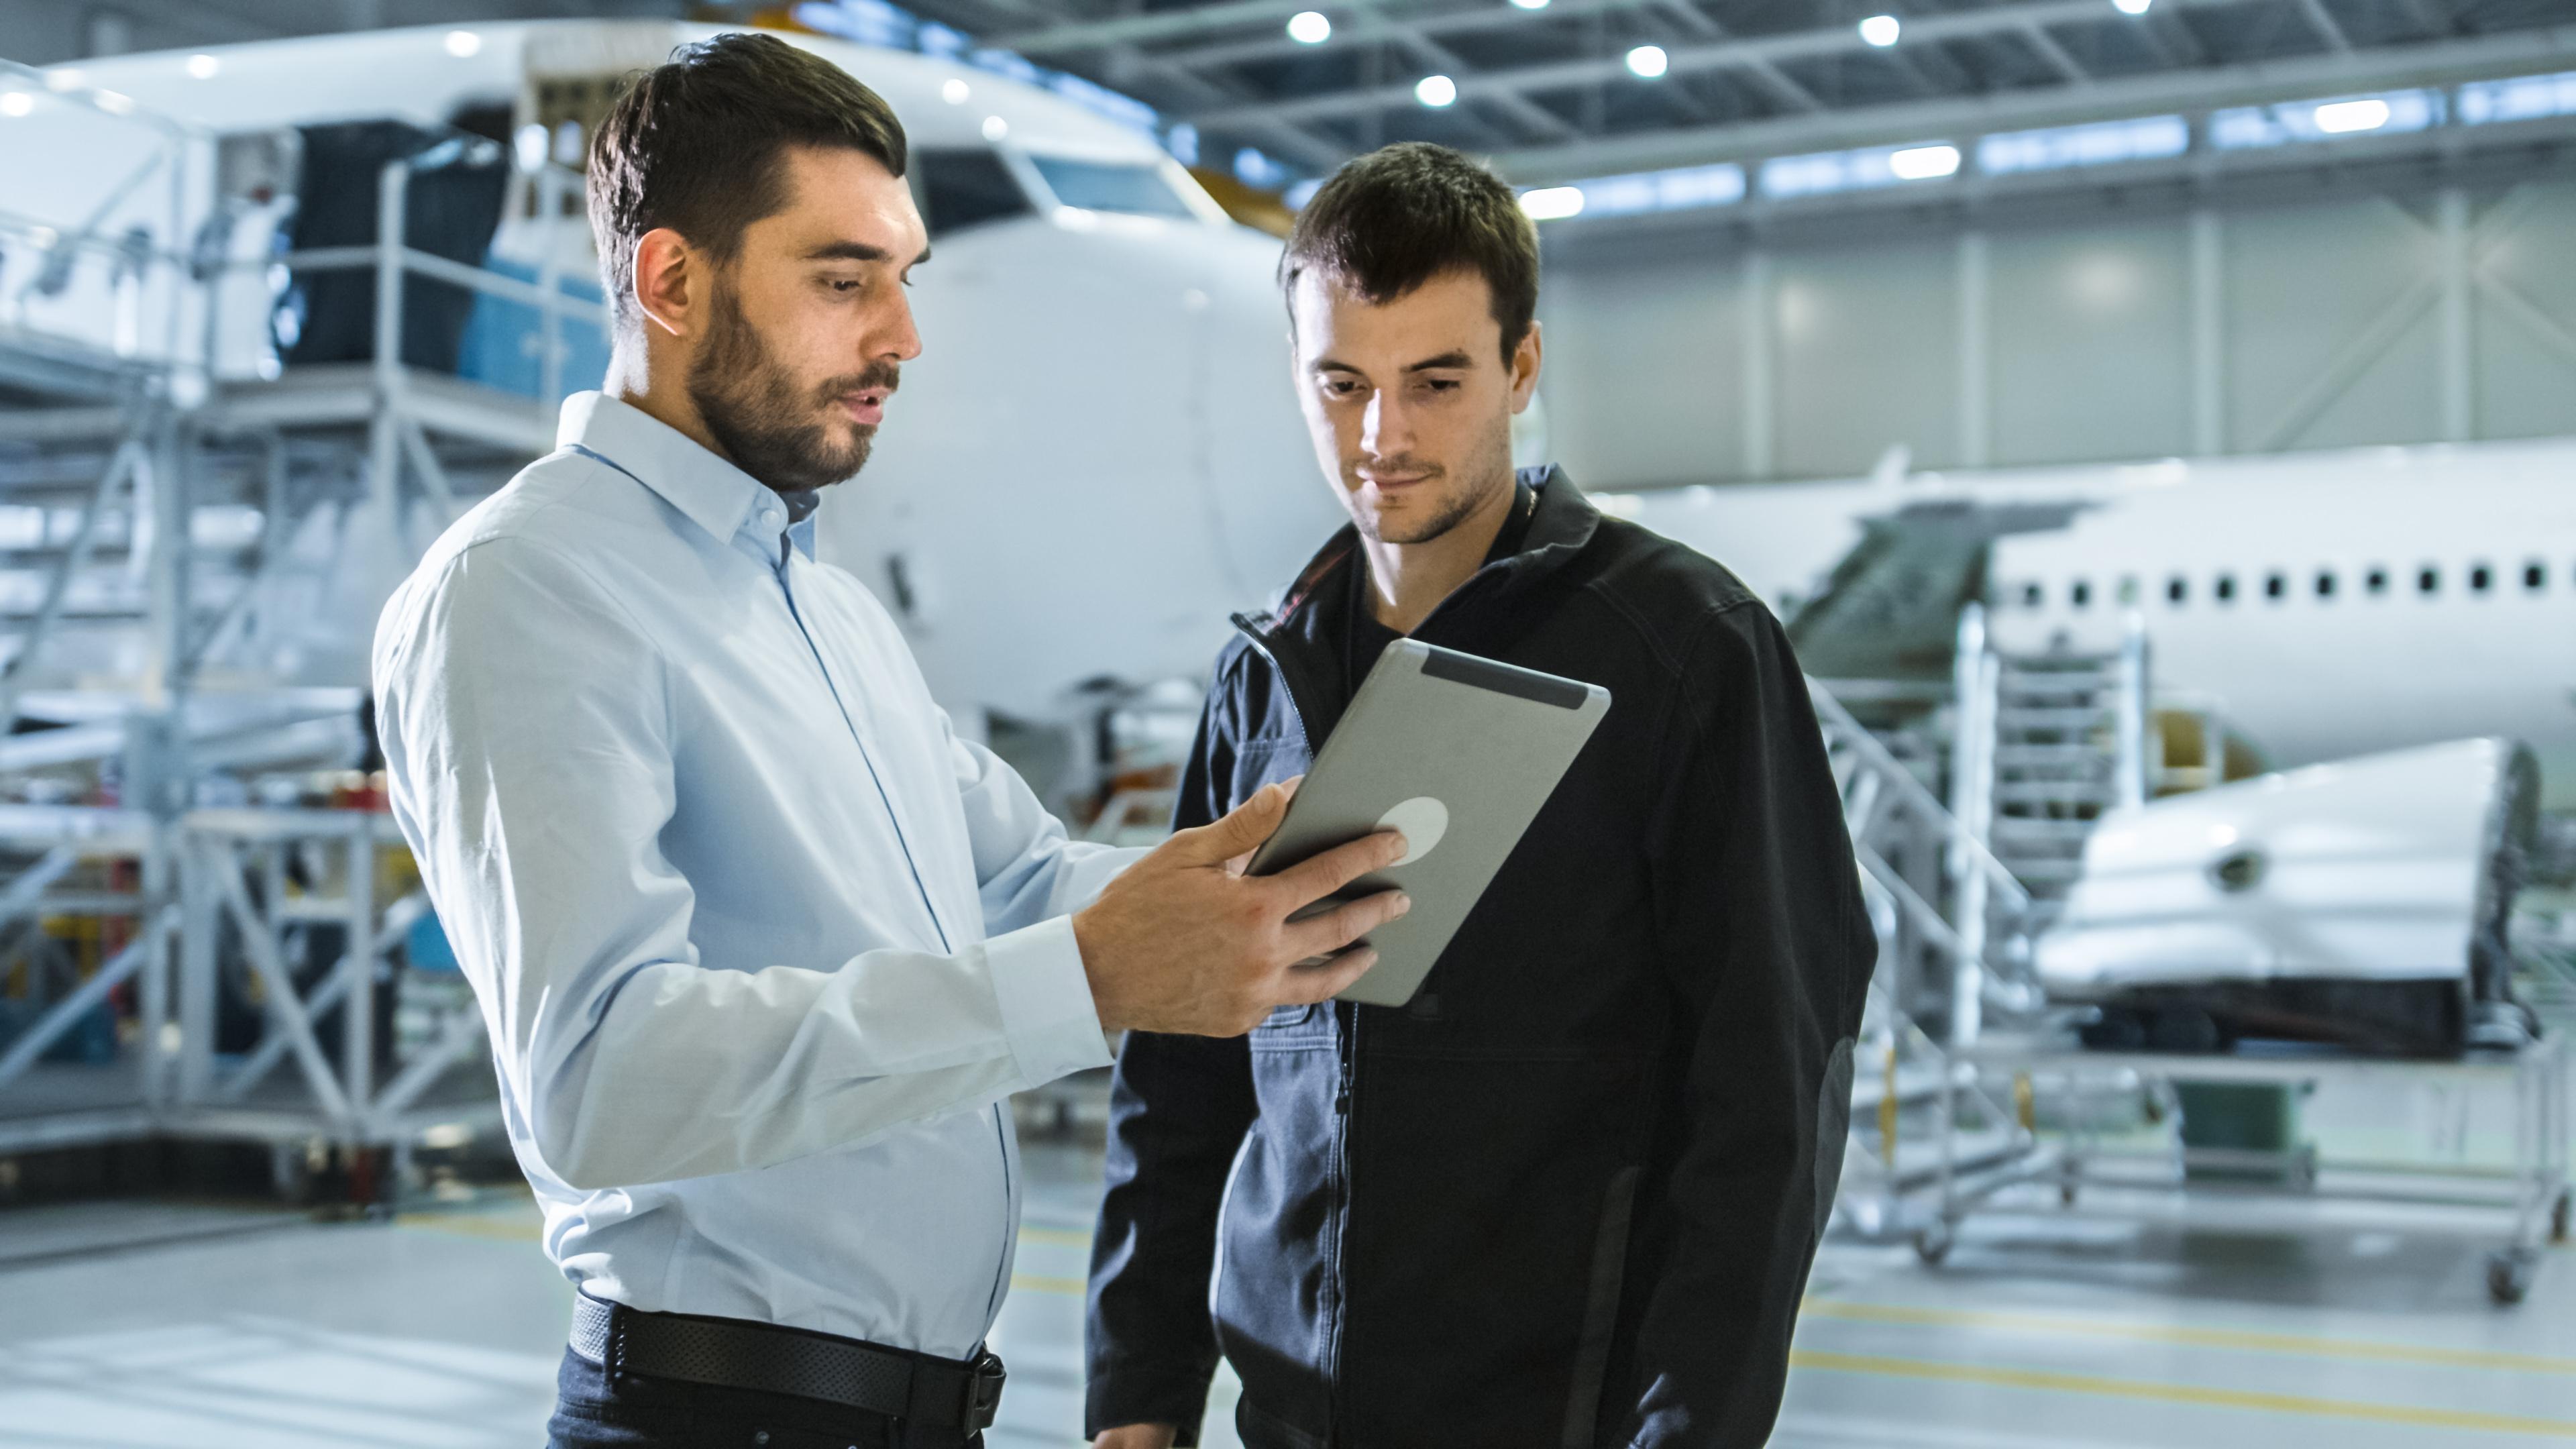 Increase the Effectiveness of Training Programs with Employee Feedback